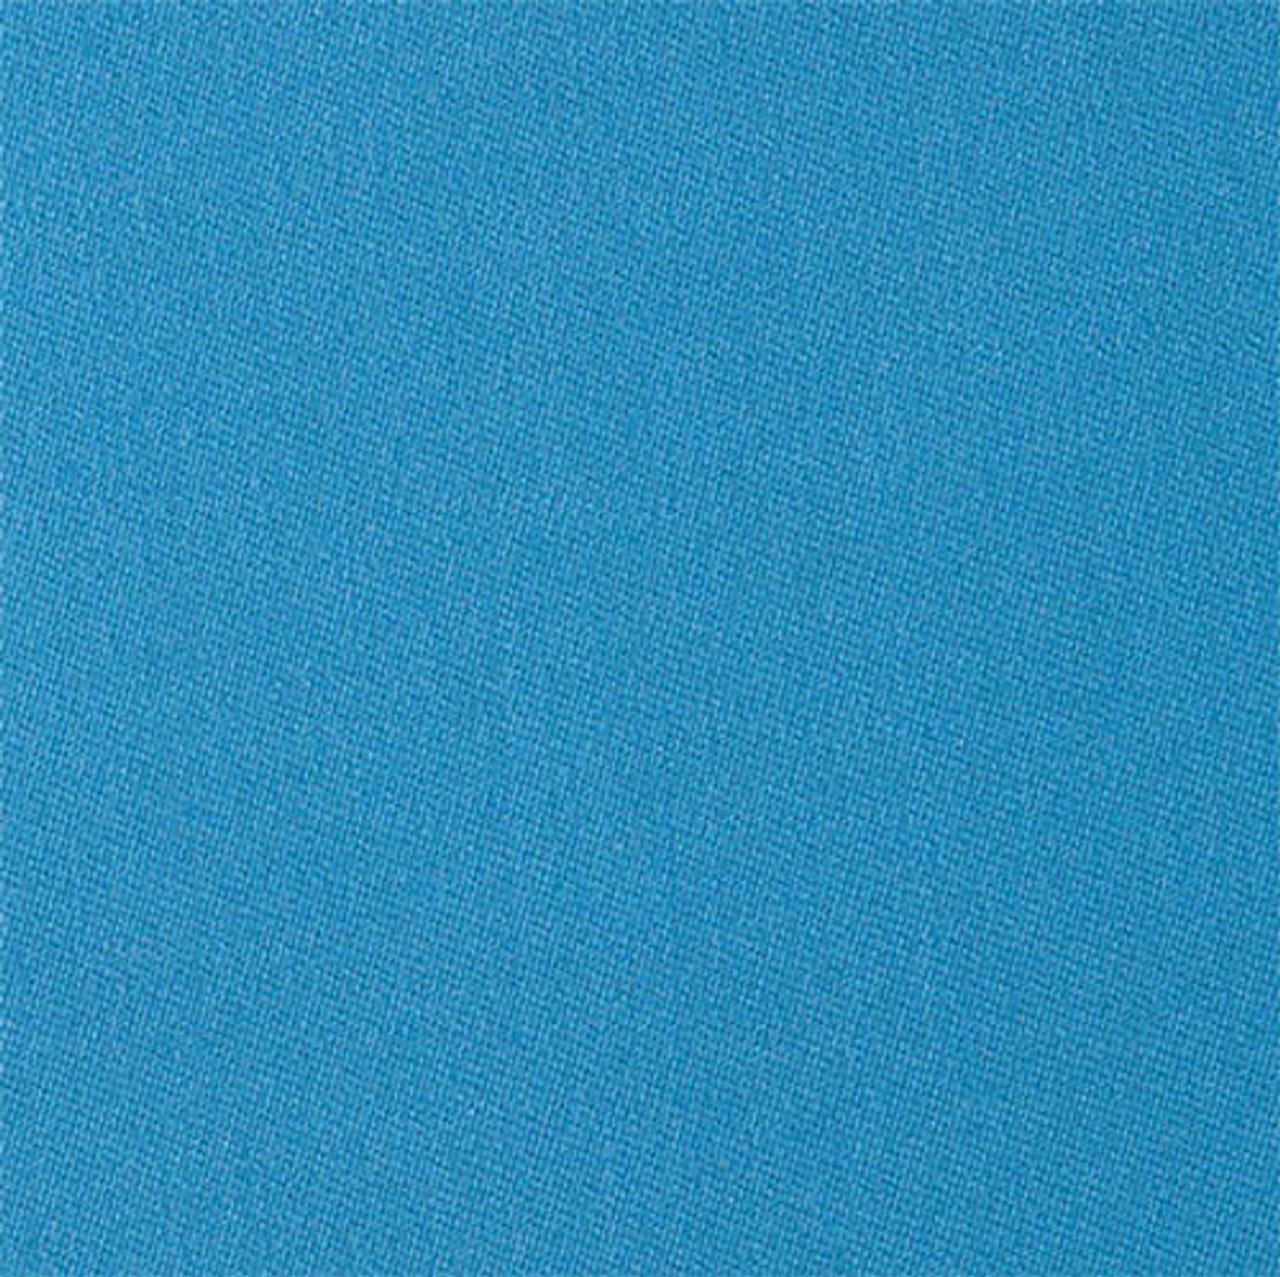 Simonis 760 Cloth 7/' Set Simonis Electric Blue Pool Table Cloth Free Shipping!